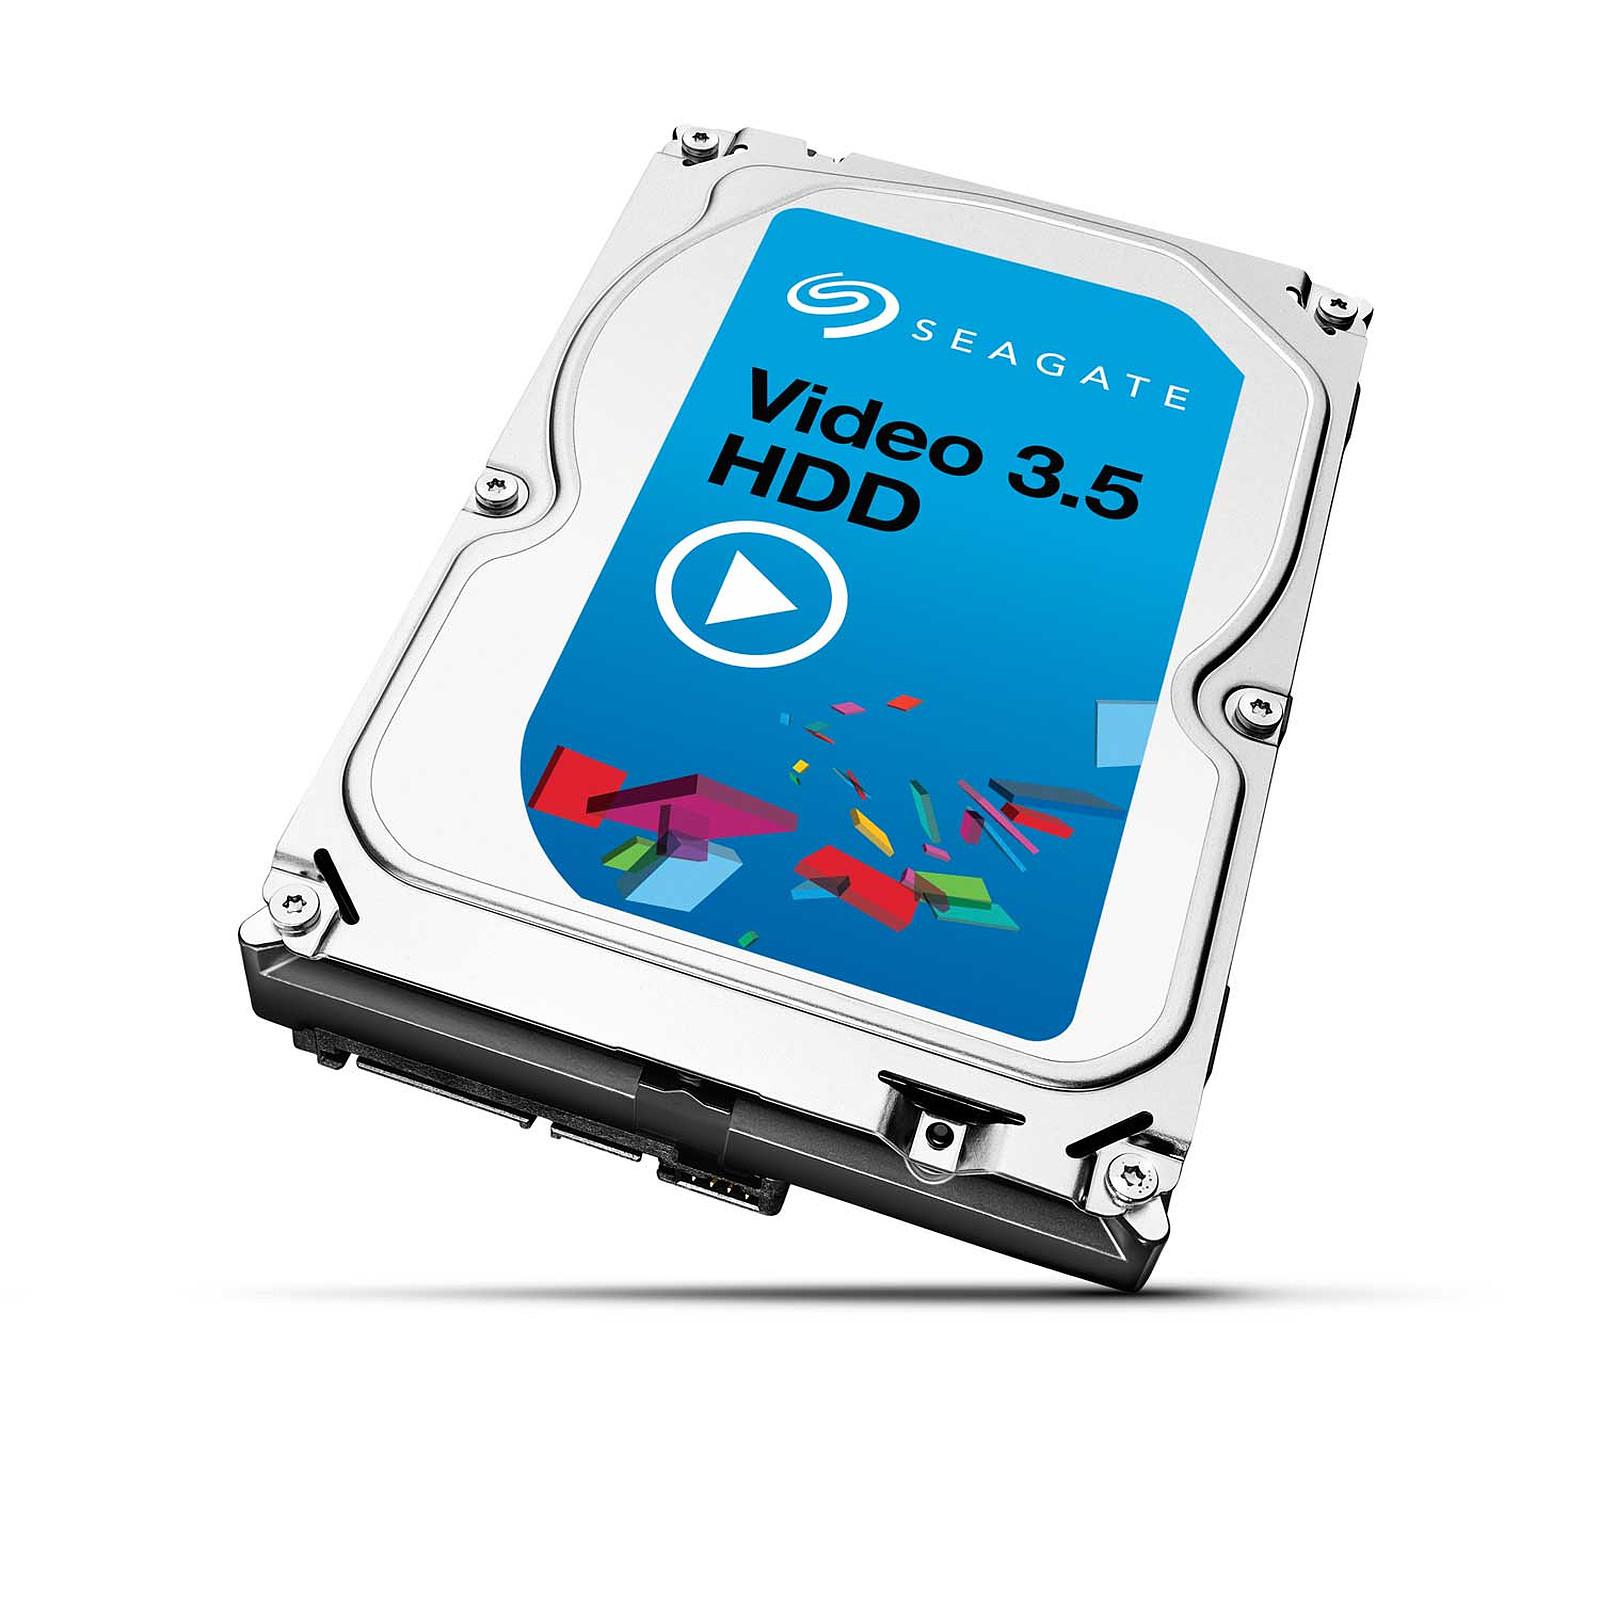 Seagate Video 3.5 HDD 3 TB